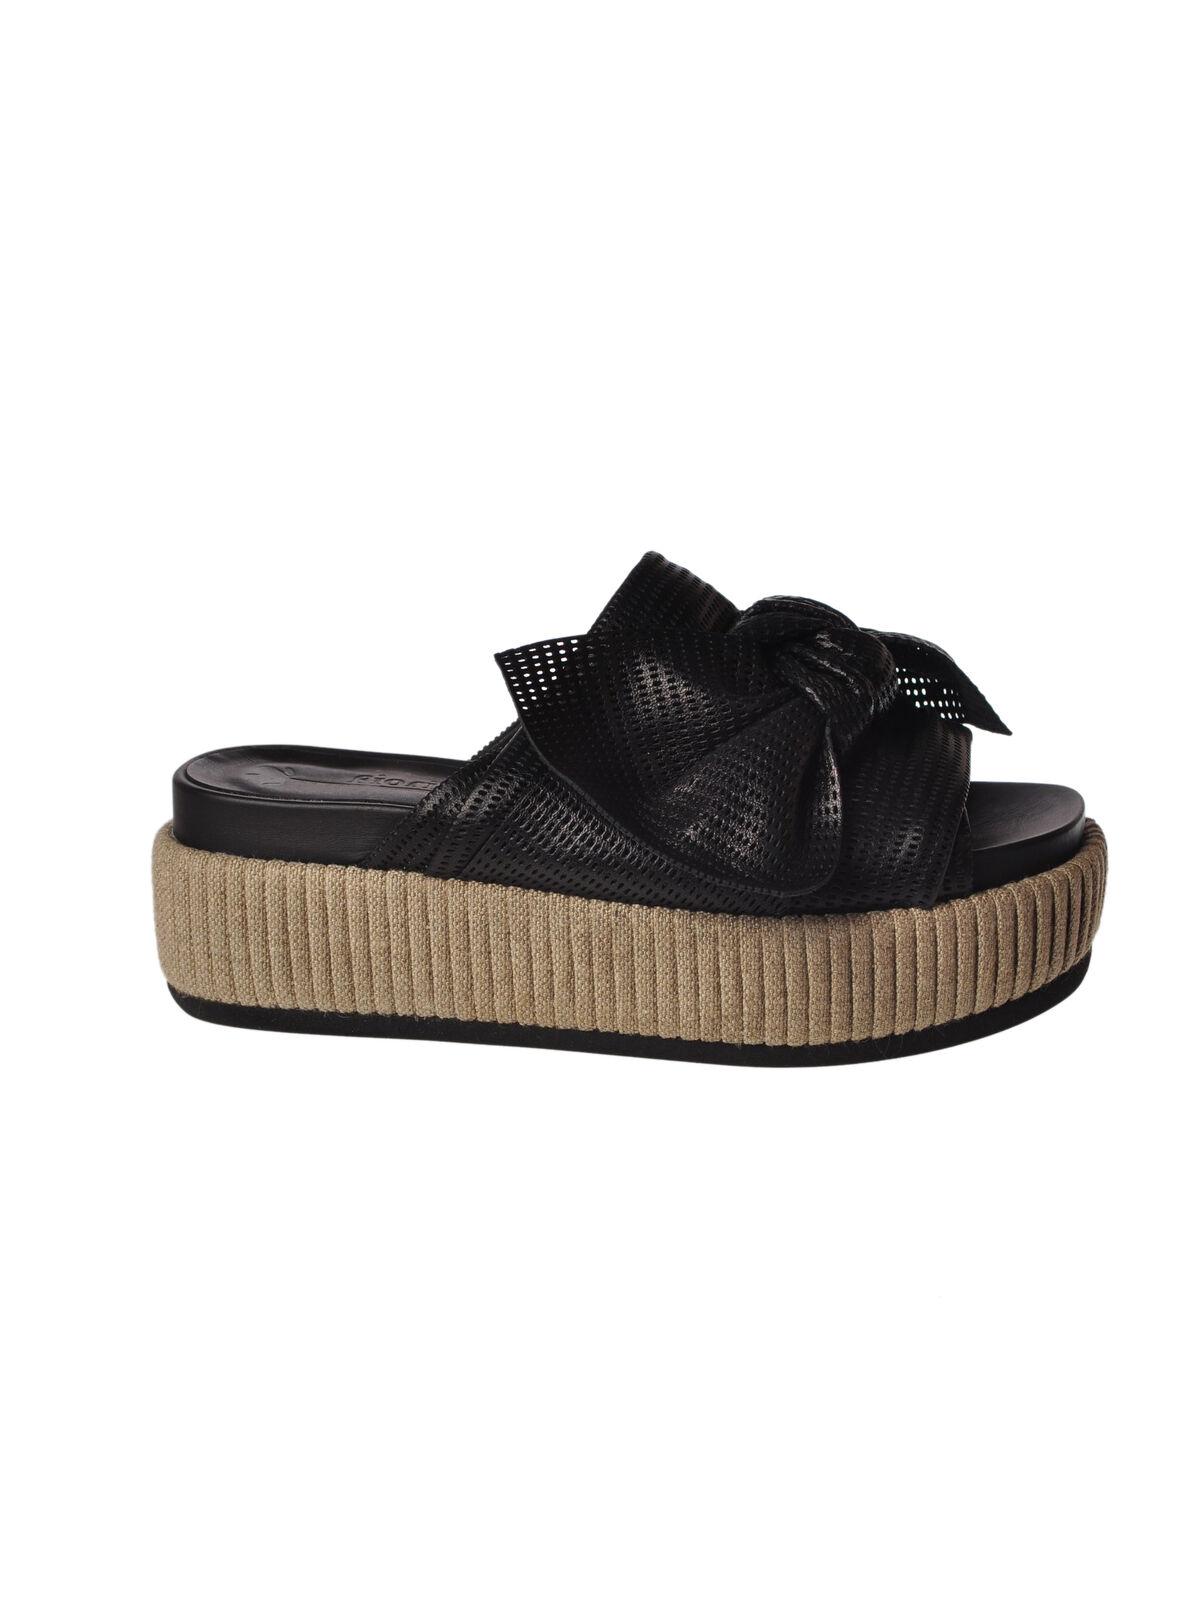 Fiorifrancesi-Zapatos-Zapatos-Mujer Fiorifrancesi-Zapatos-Zapatos-Mujer Fiorifrancesi-Zapatos-Zapatos-Mujer - Negro - 4839321G185141  60% de descuento